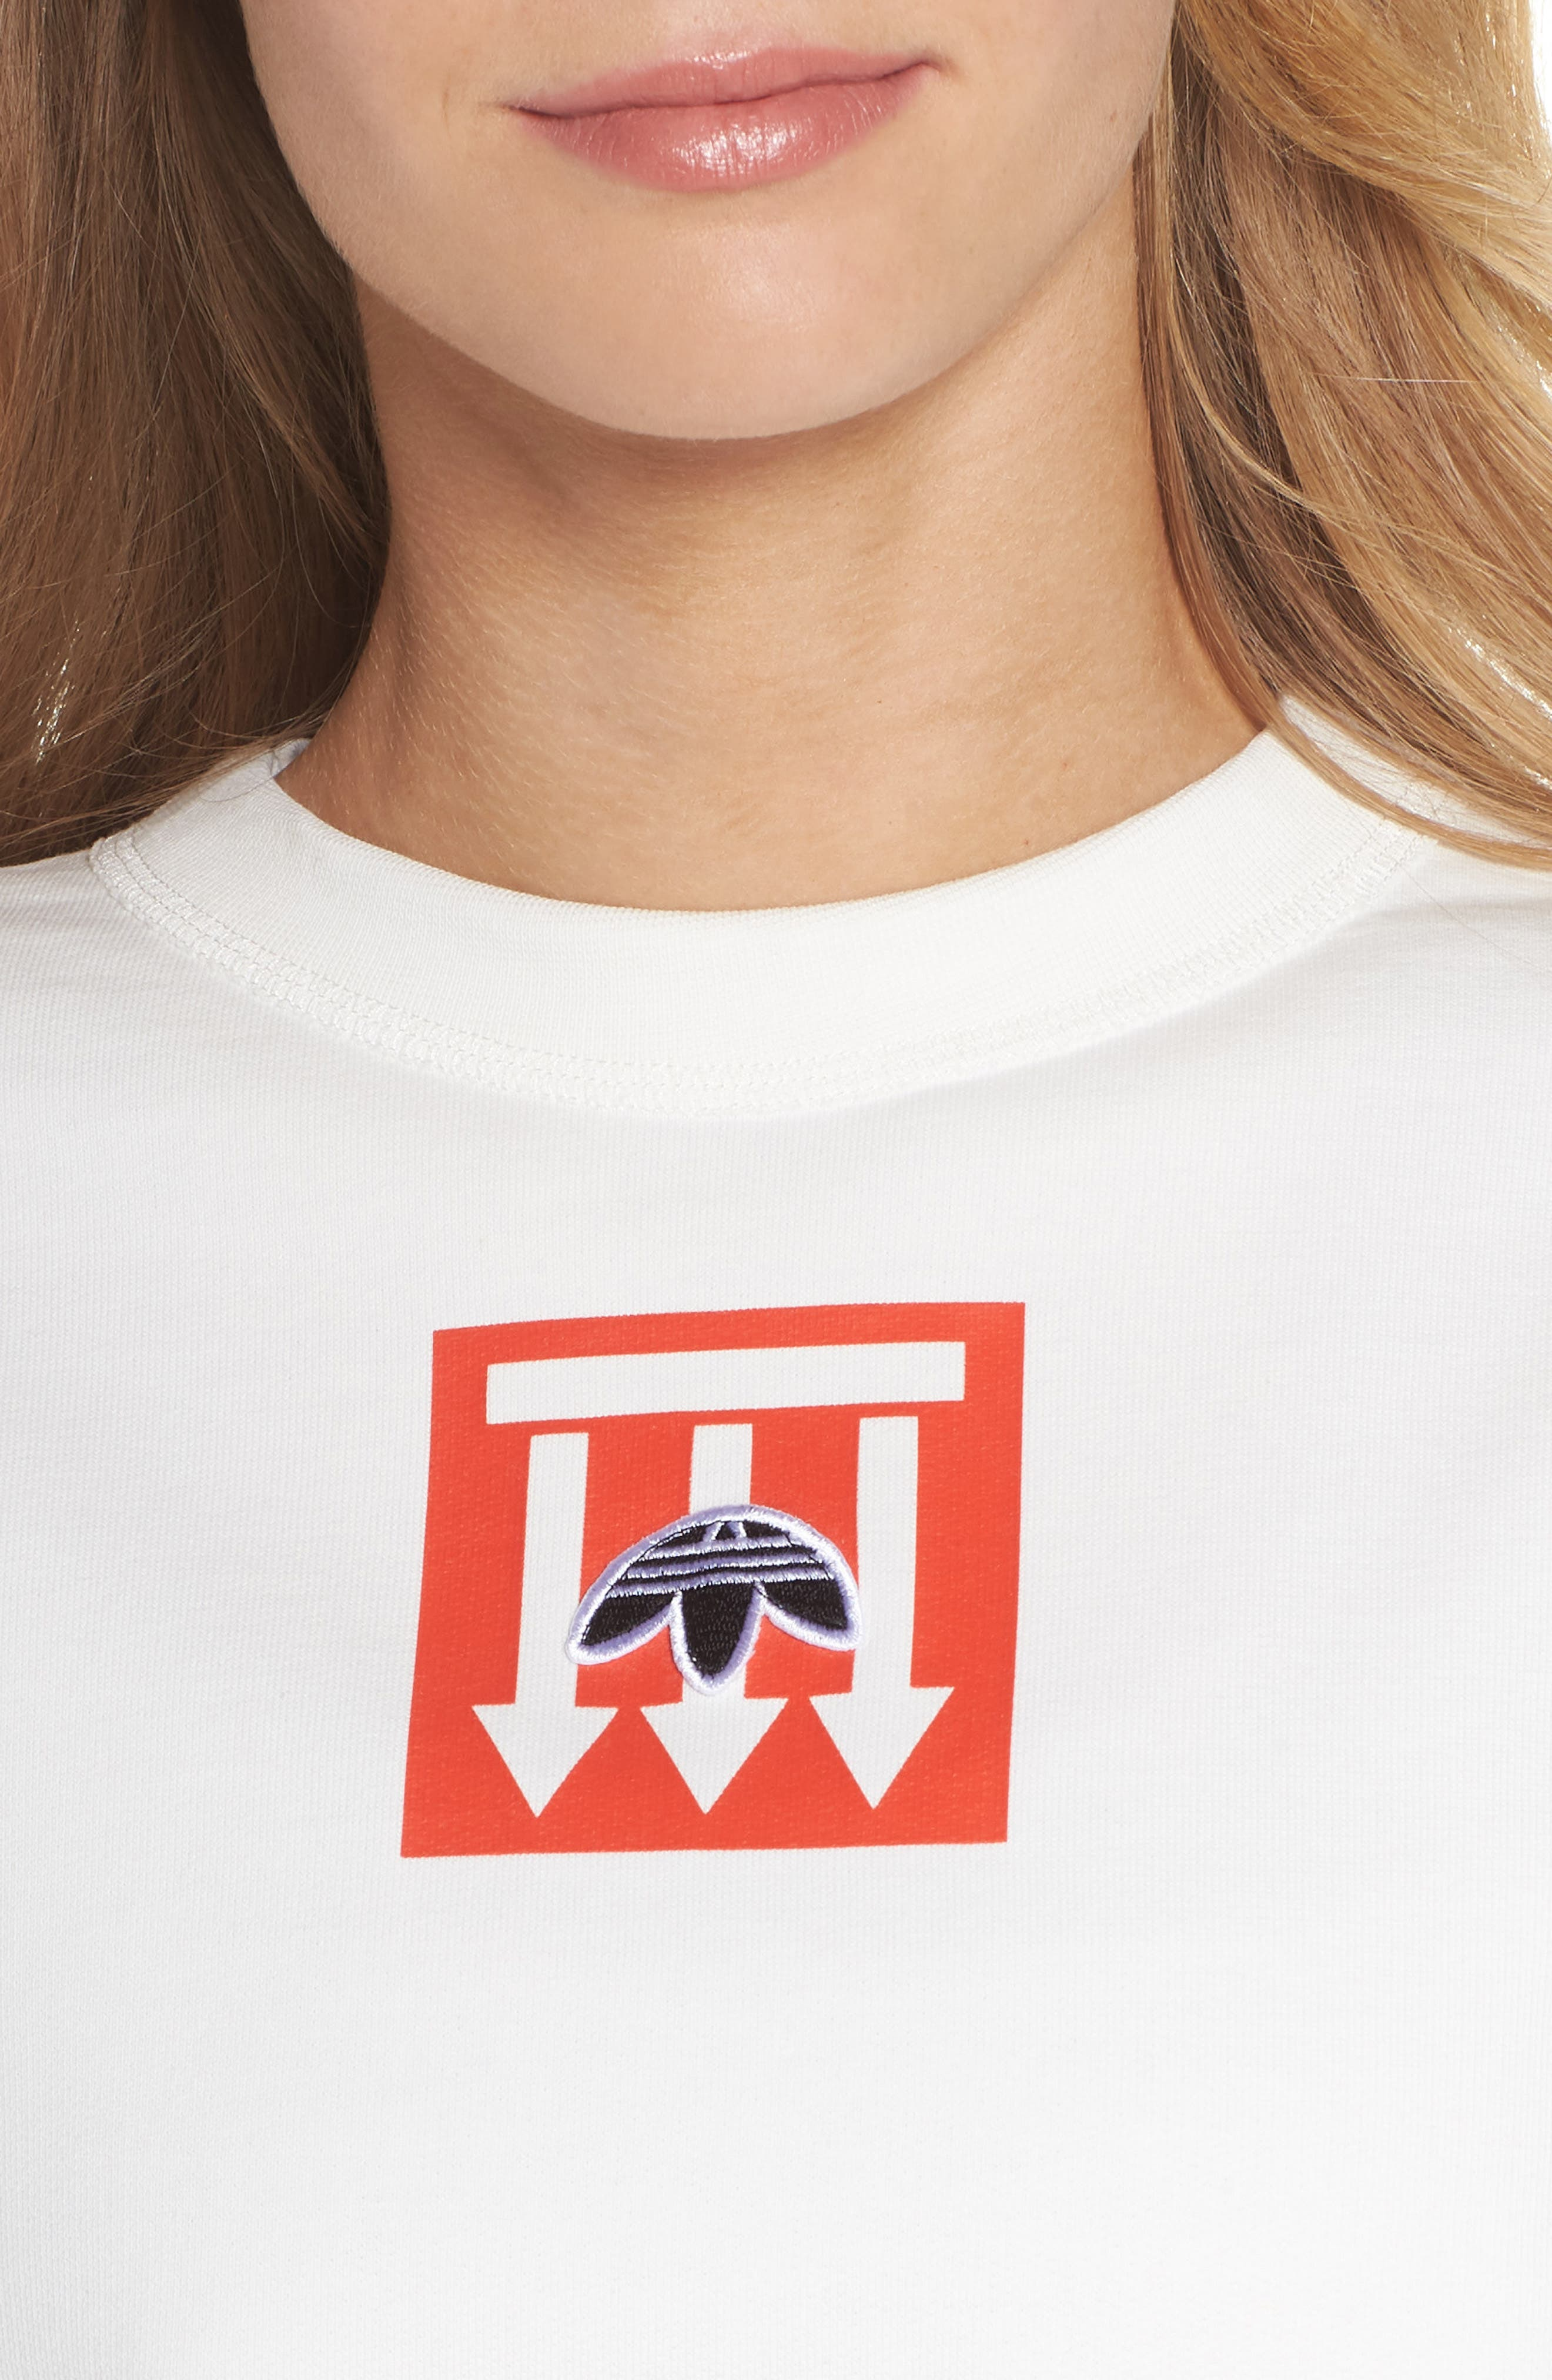 adidas x Alexander Wang Graphite Sweatshirt,                             Alternate thumbnail 4, color,                             900